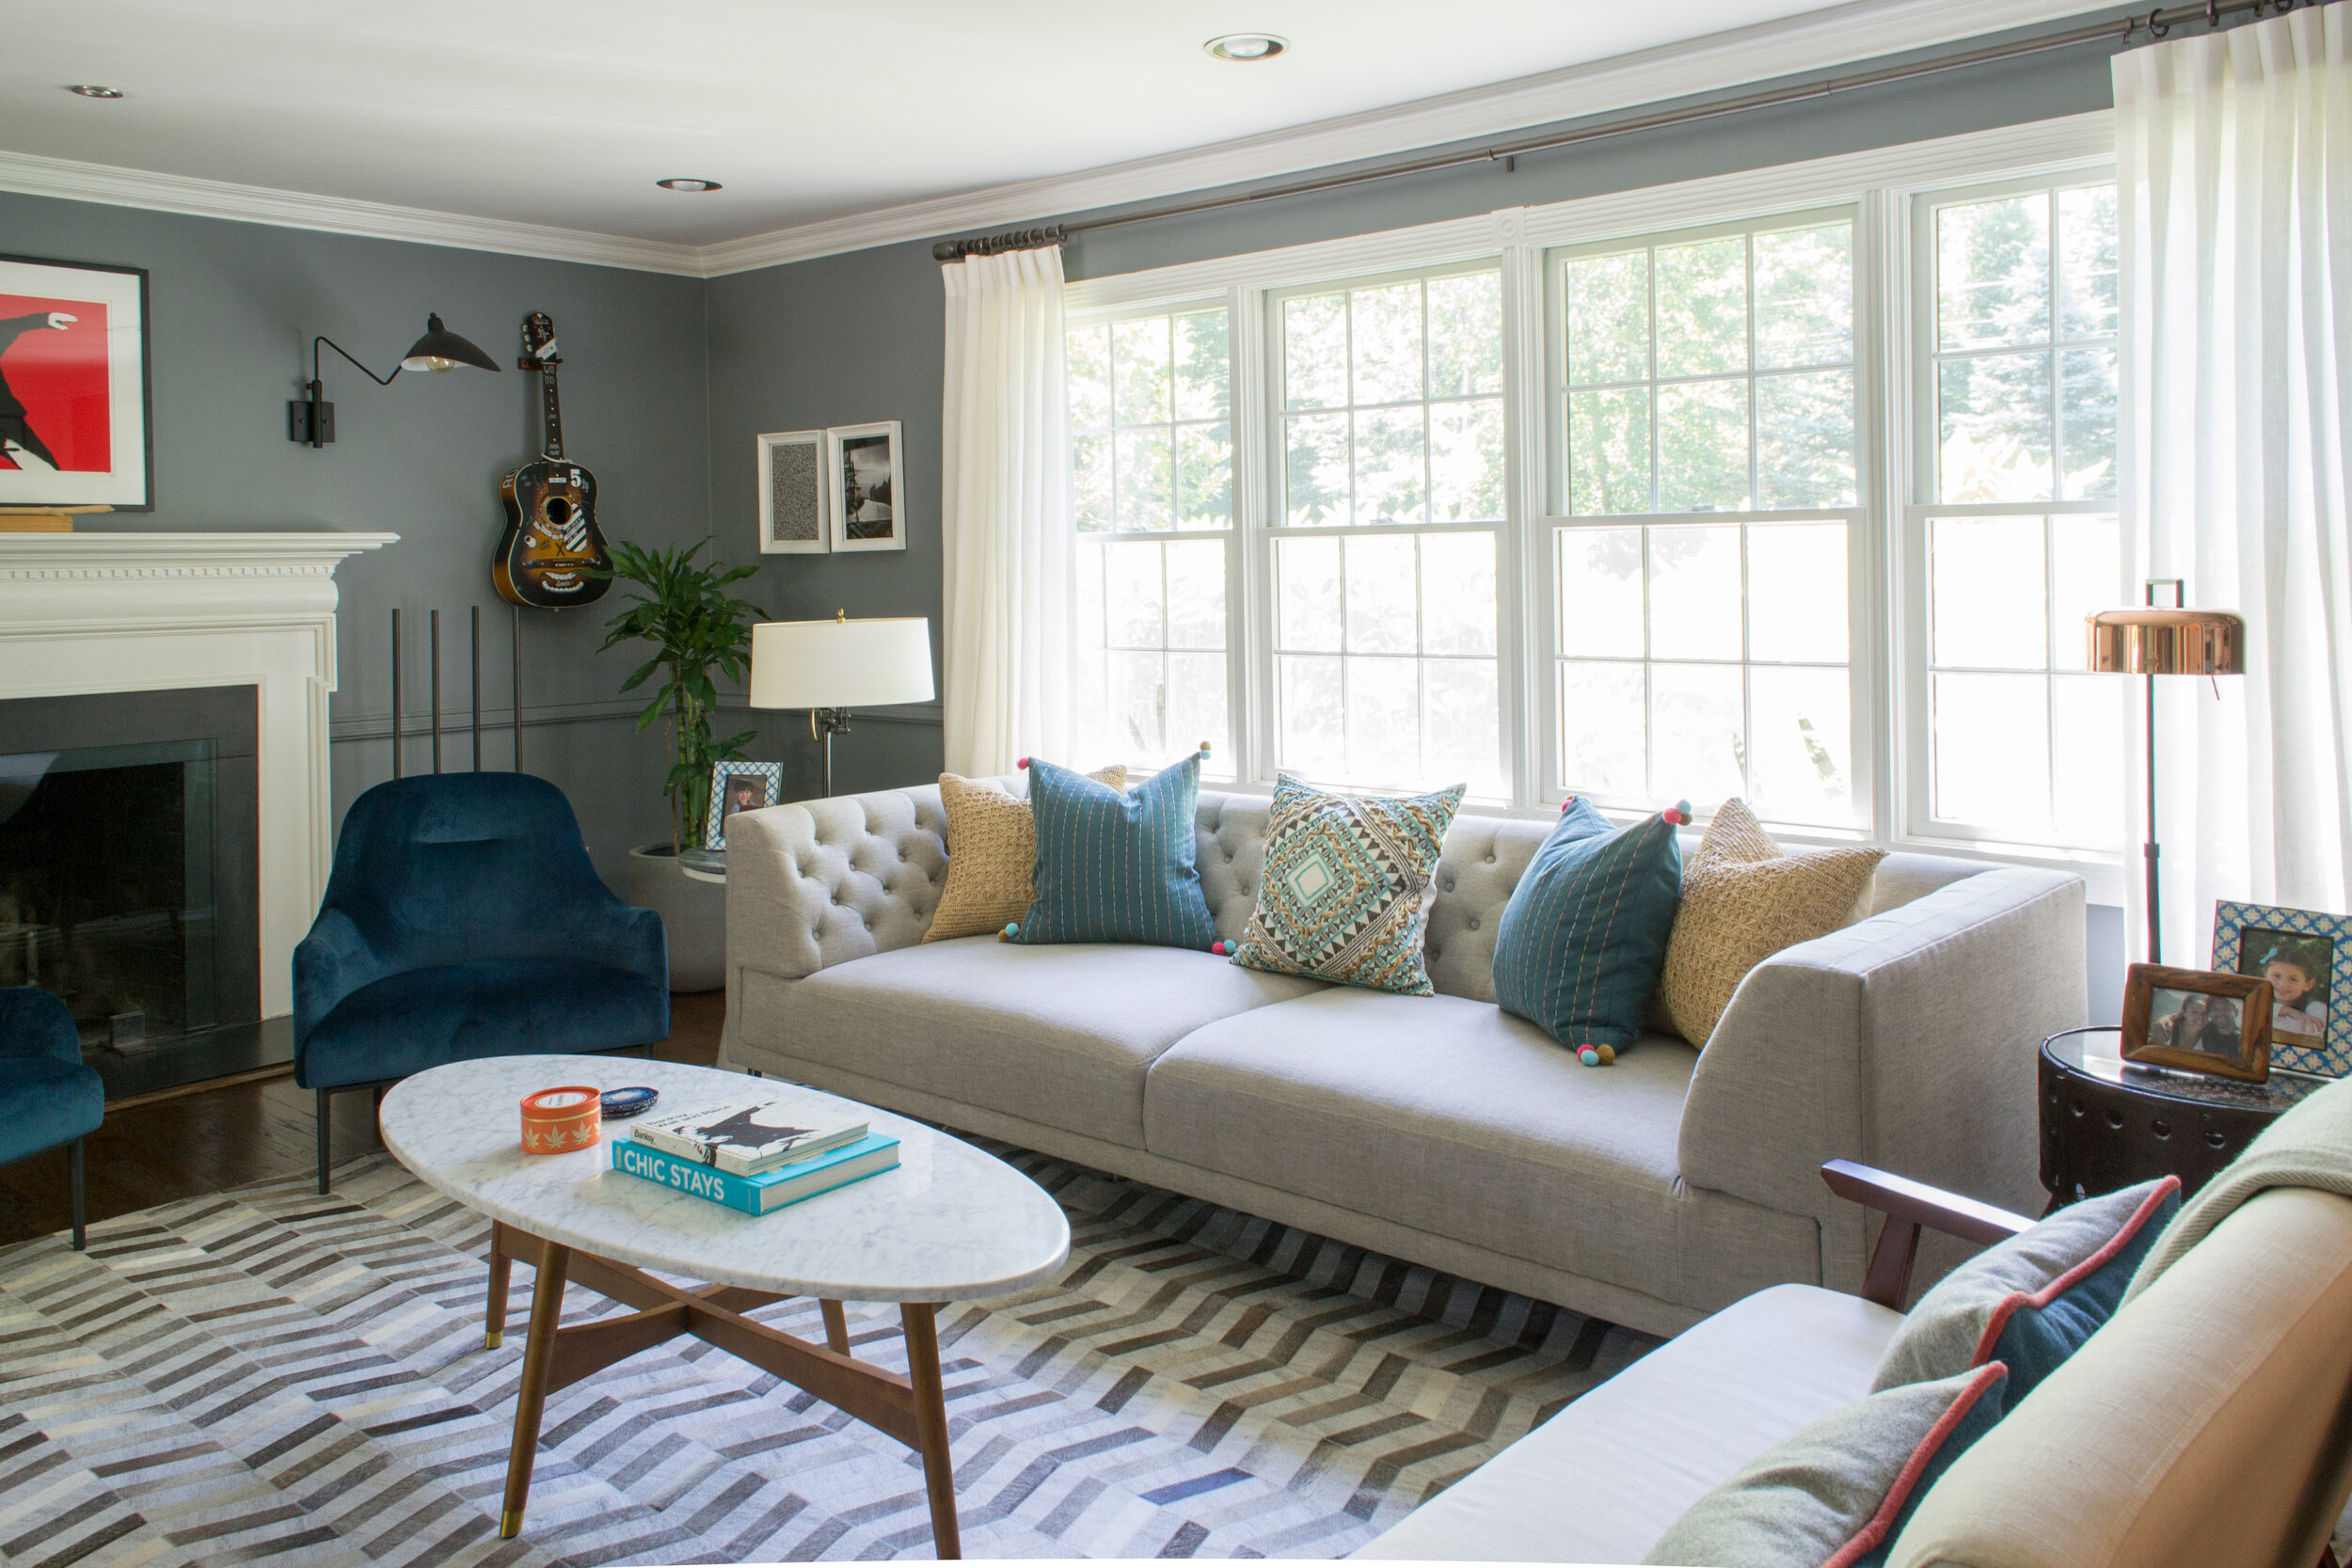 living-room-pop-of-color-tc-interiors-2.jpg